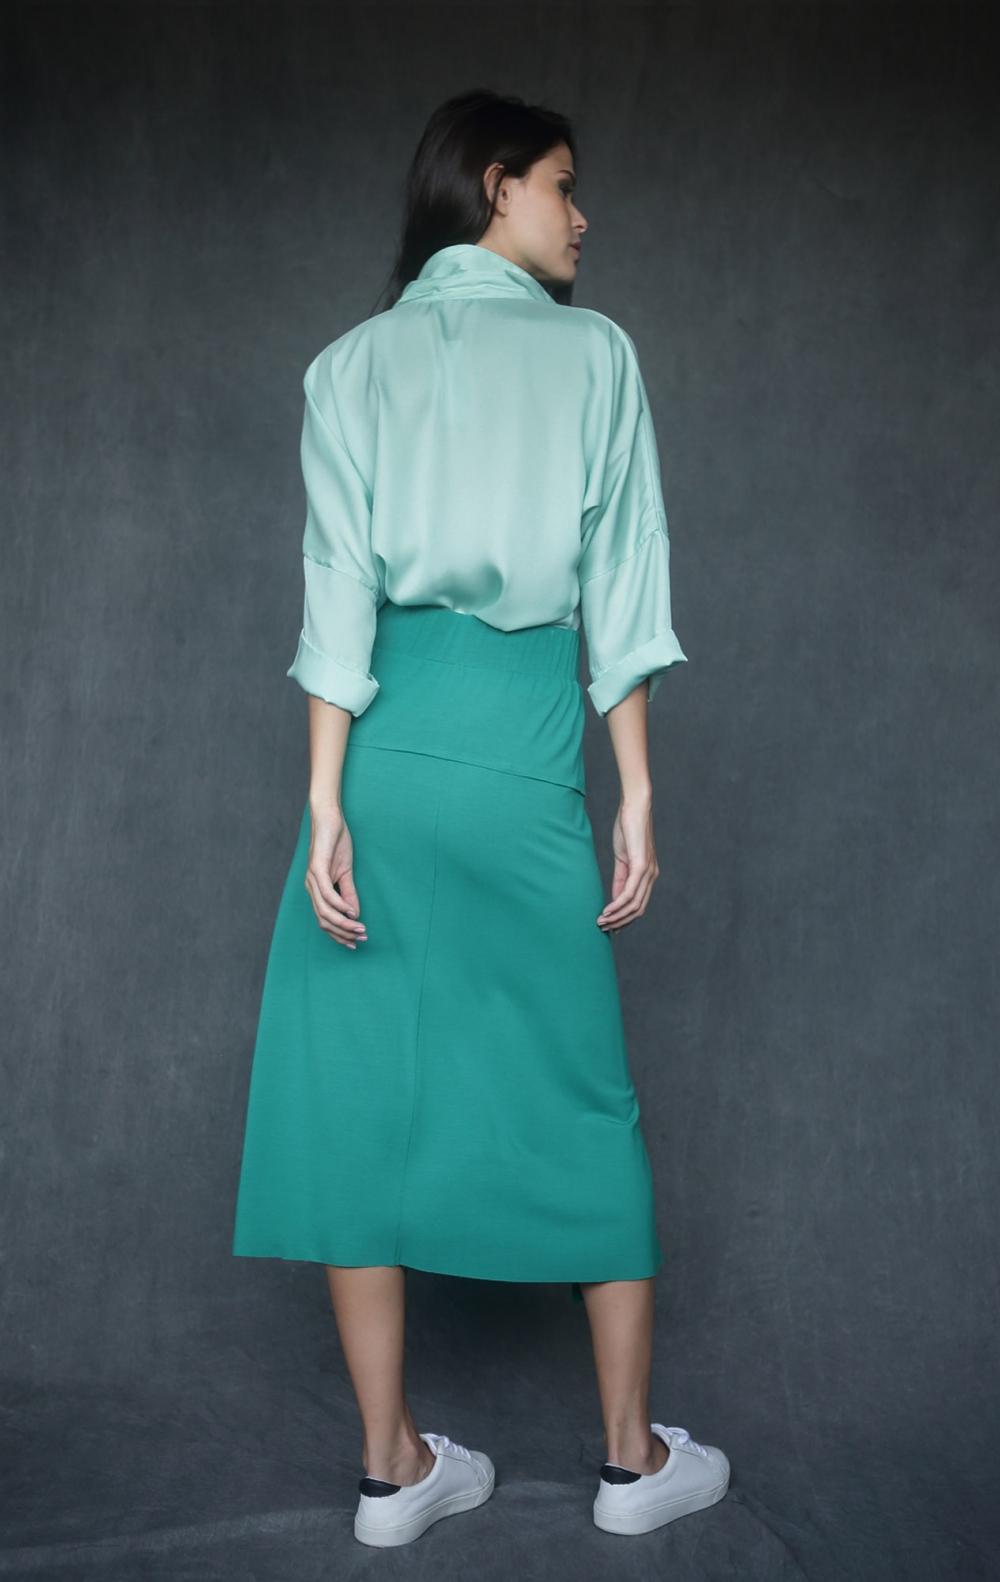 Camisa Polo Verde  - Foto 2